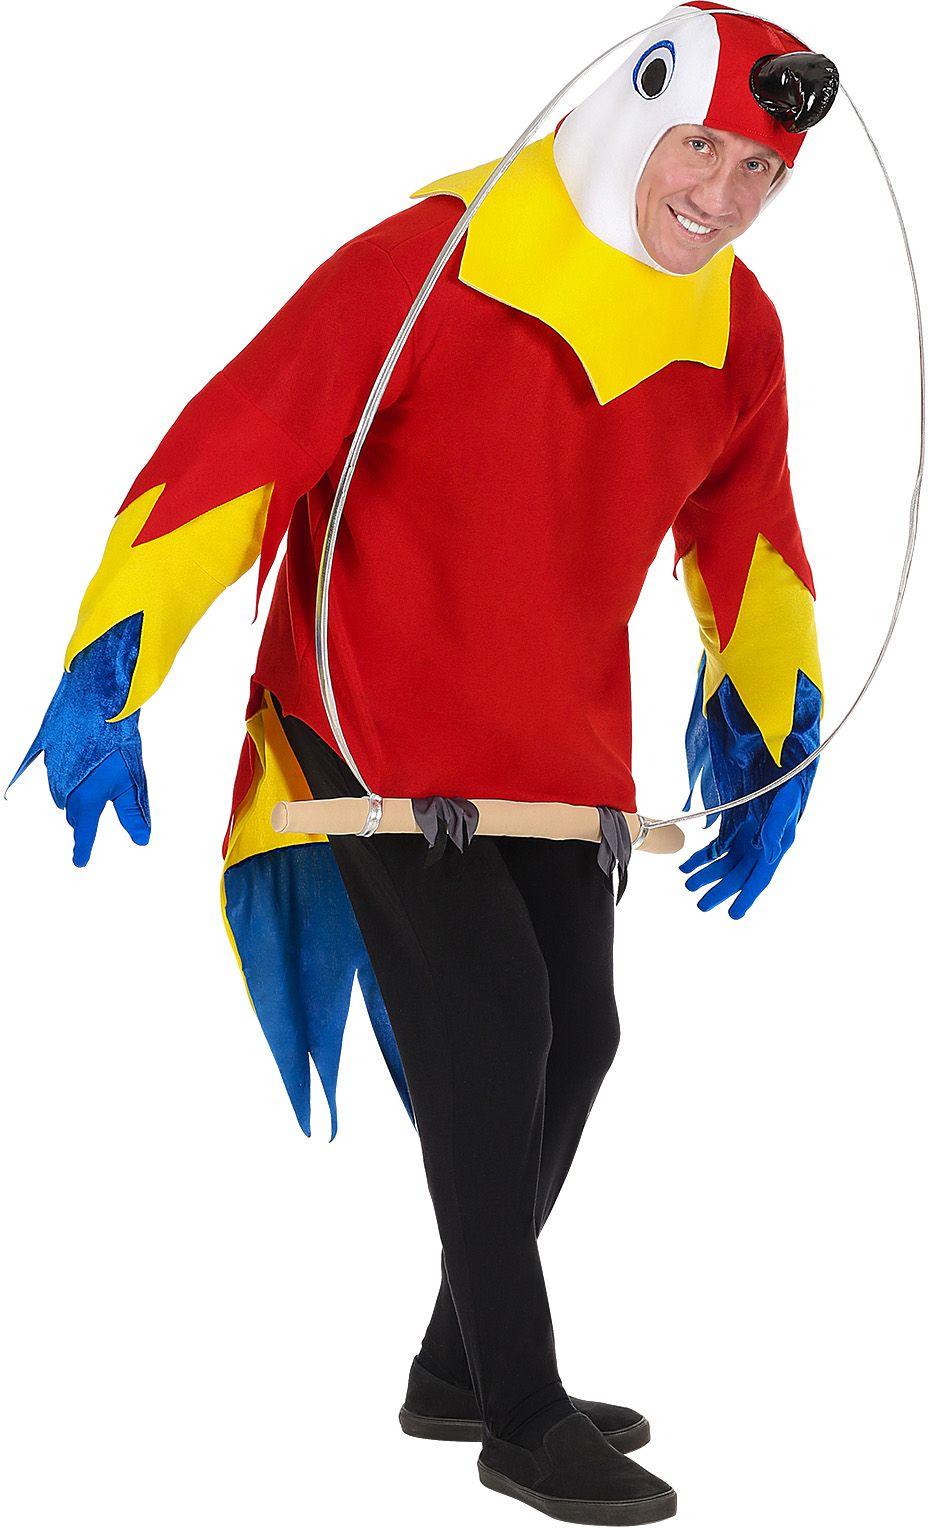 Papagaai op een stokje outfit